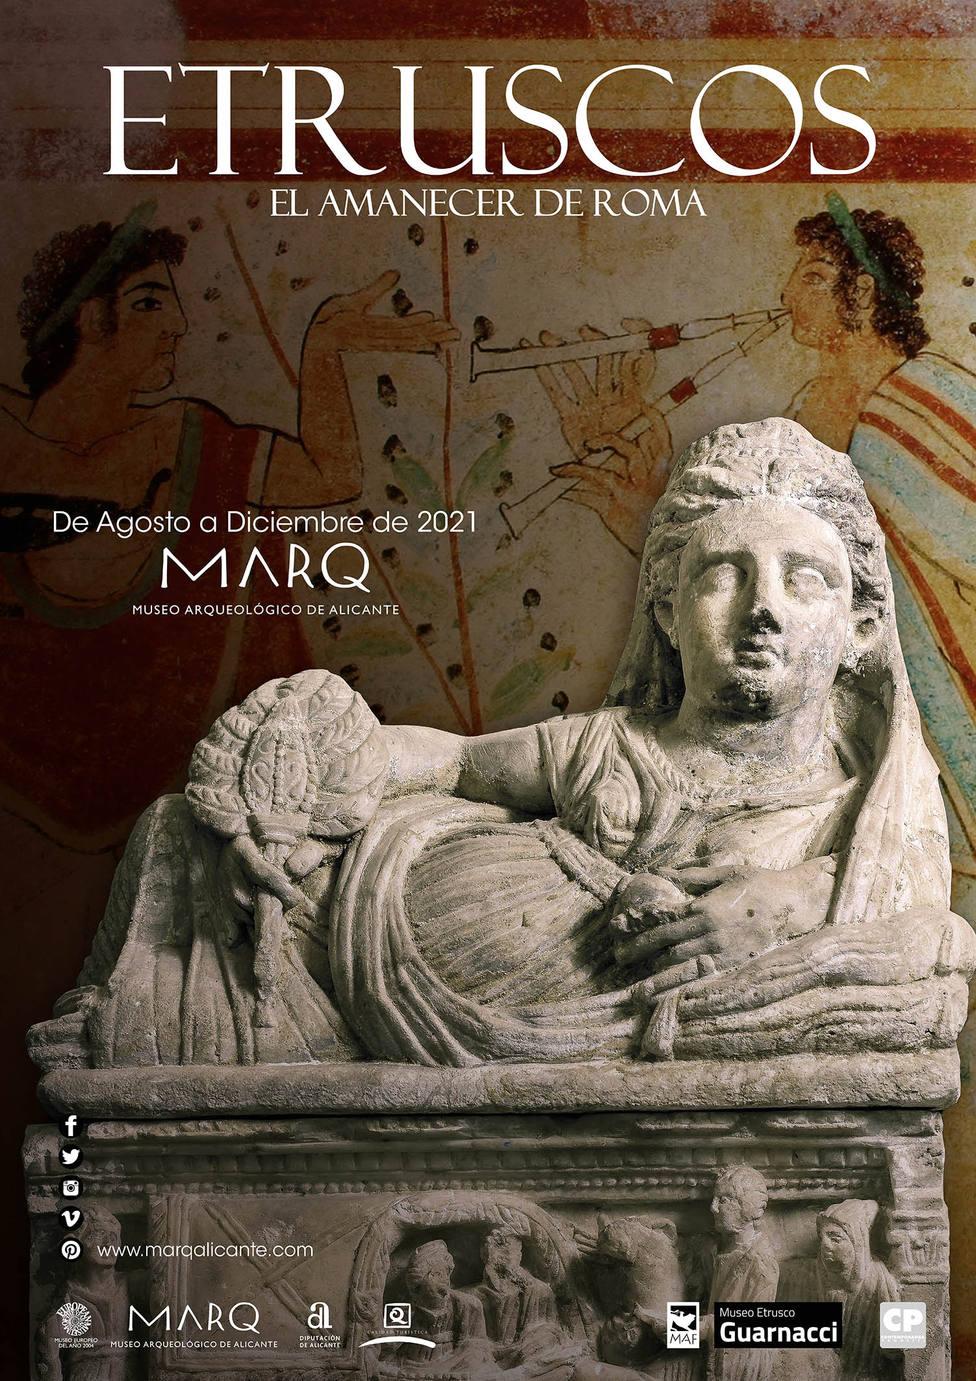 ctv-fnf-poster-etruscos